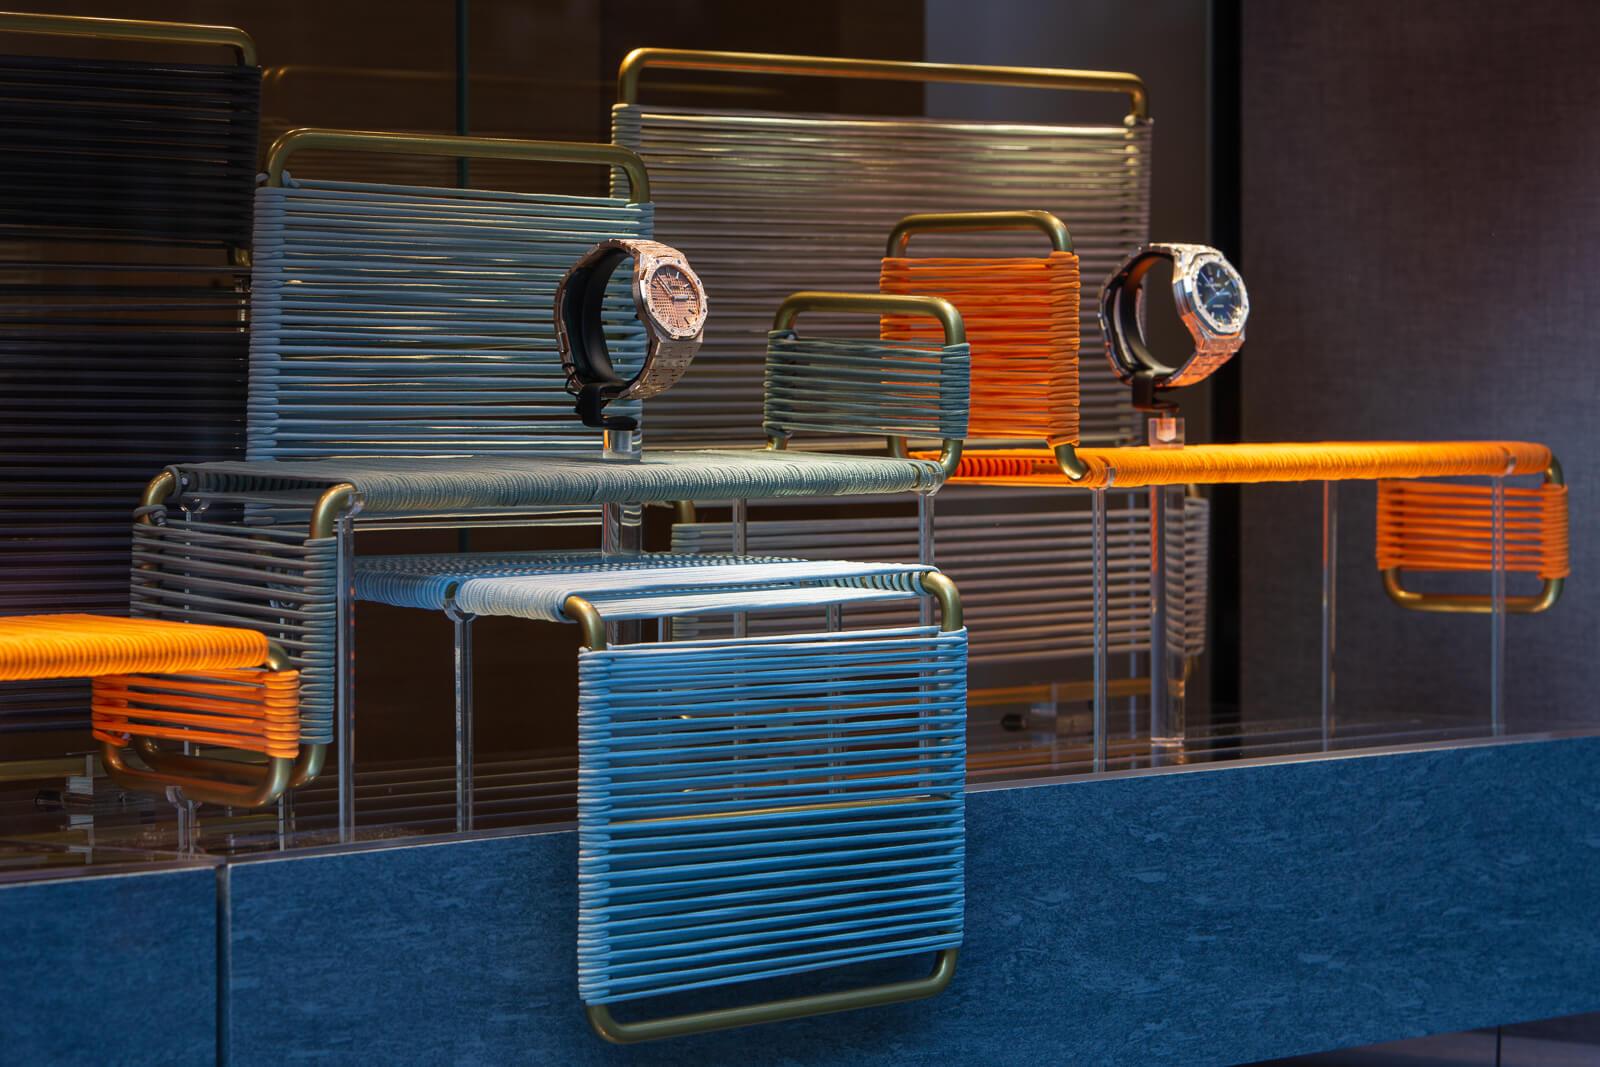 audemars-piguet-window-display-4